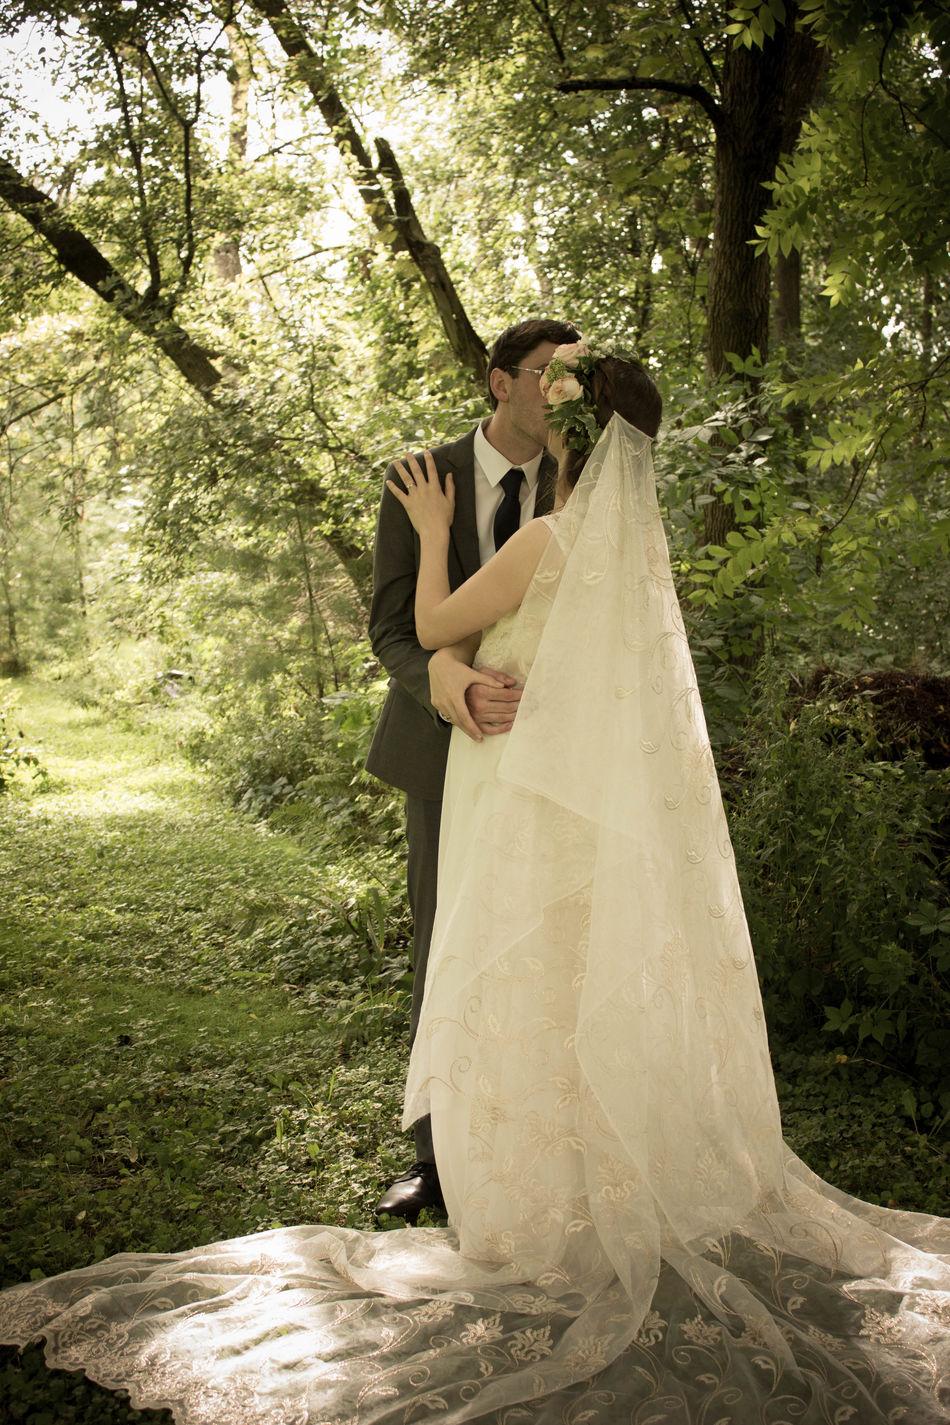 Beautiful stock photos of süße pärchen, two people, wedding dress, adult, women